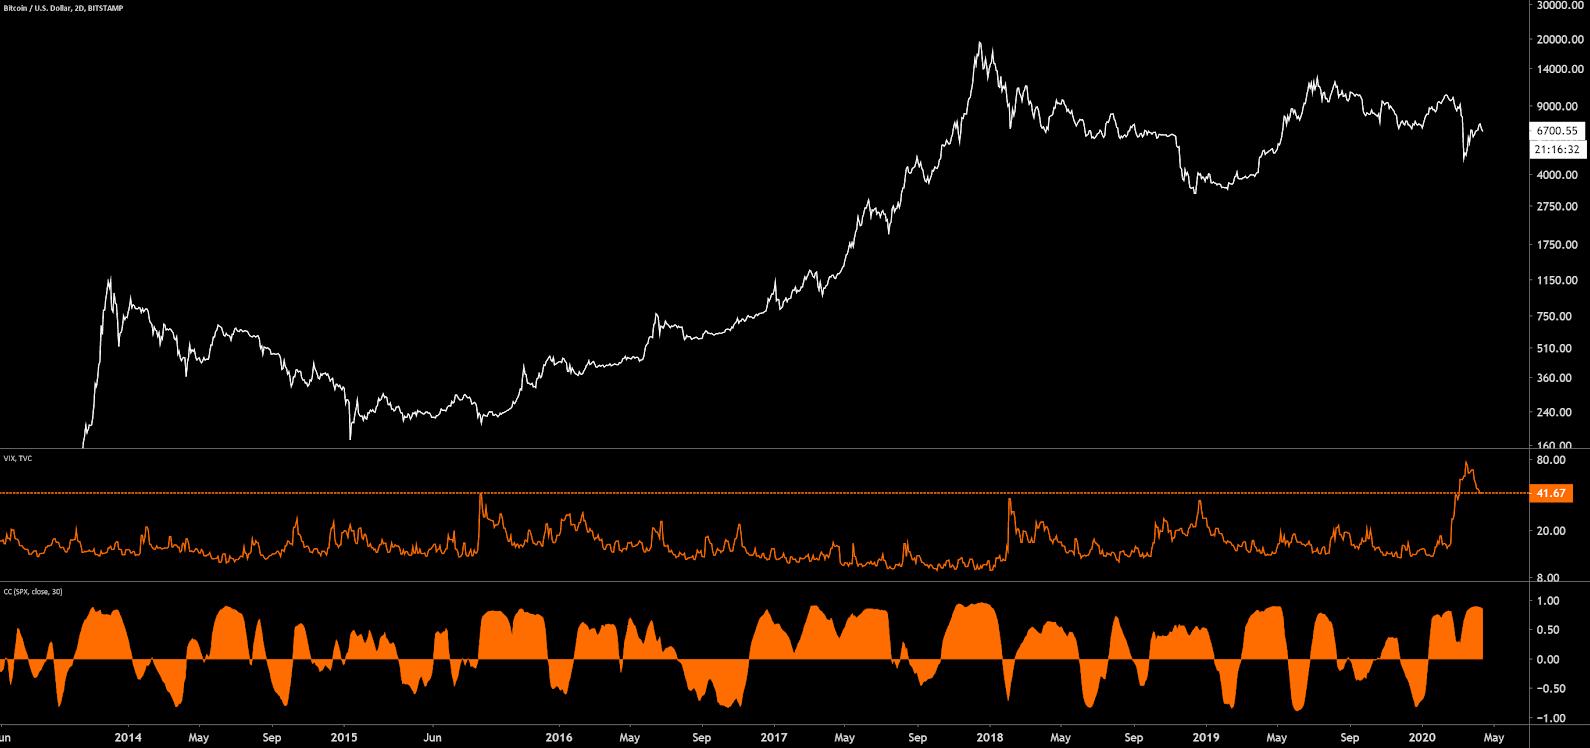 Bitcoin Price Analysis 13 Apr 2020 (20)